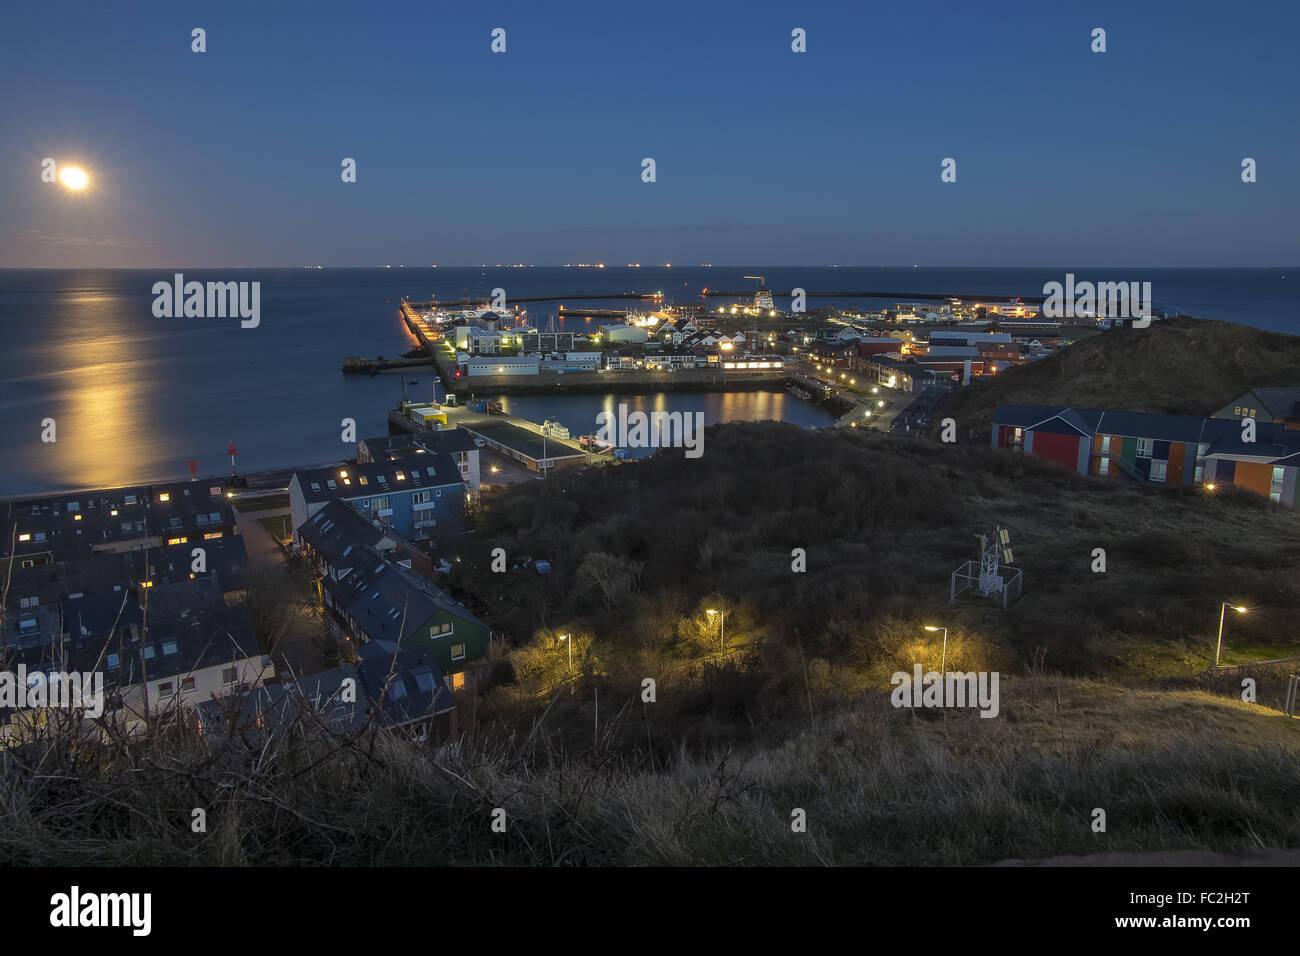 Full moon over the harbor of Heligoland - Stock Image